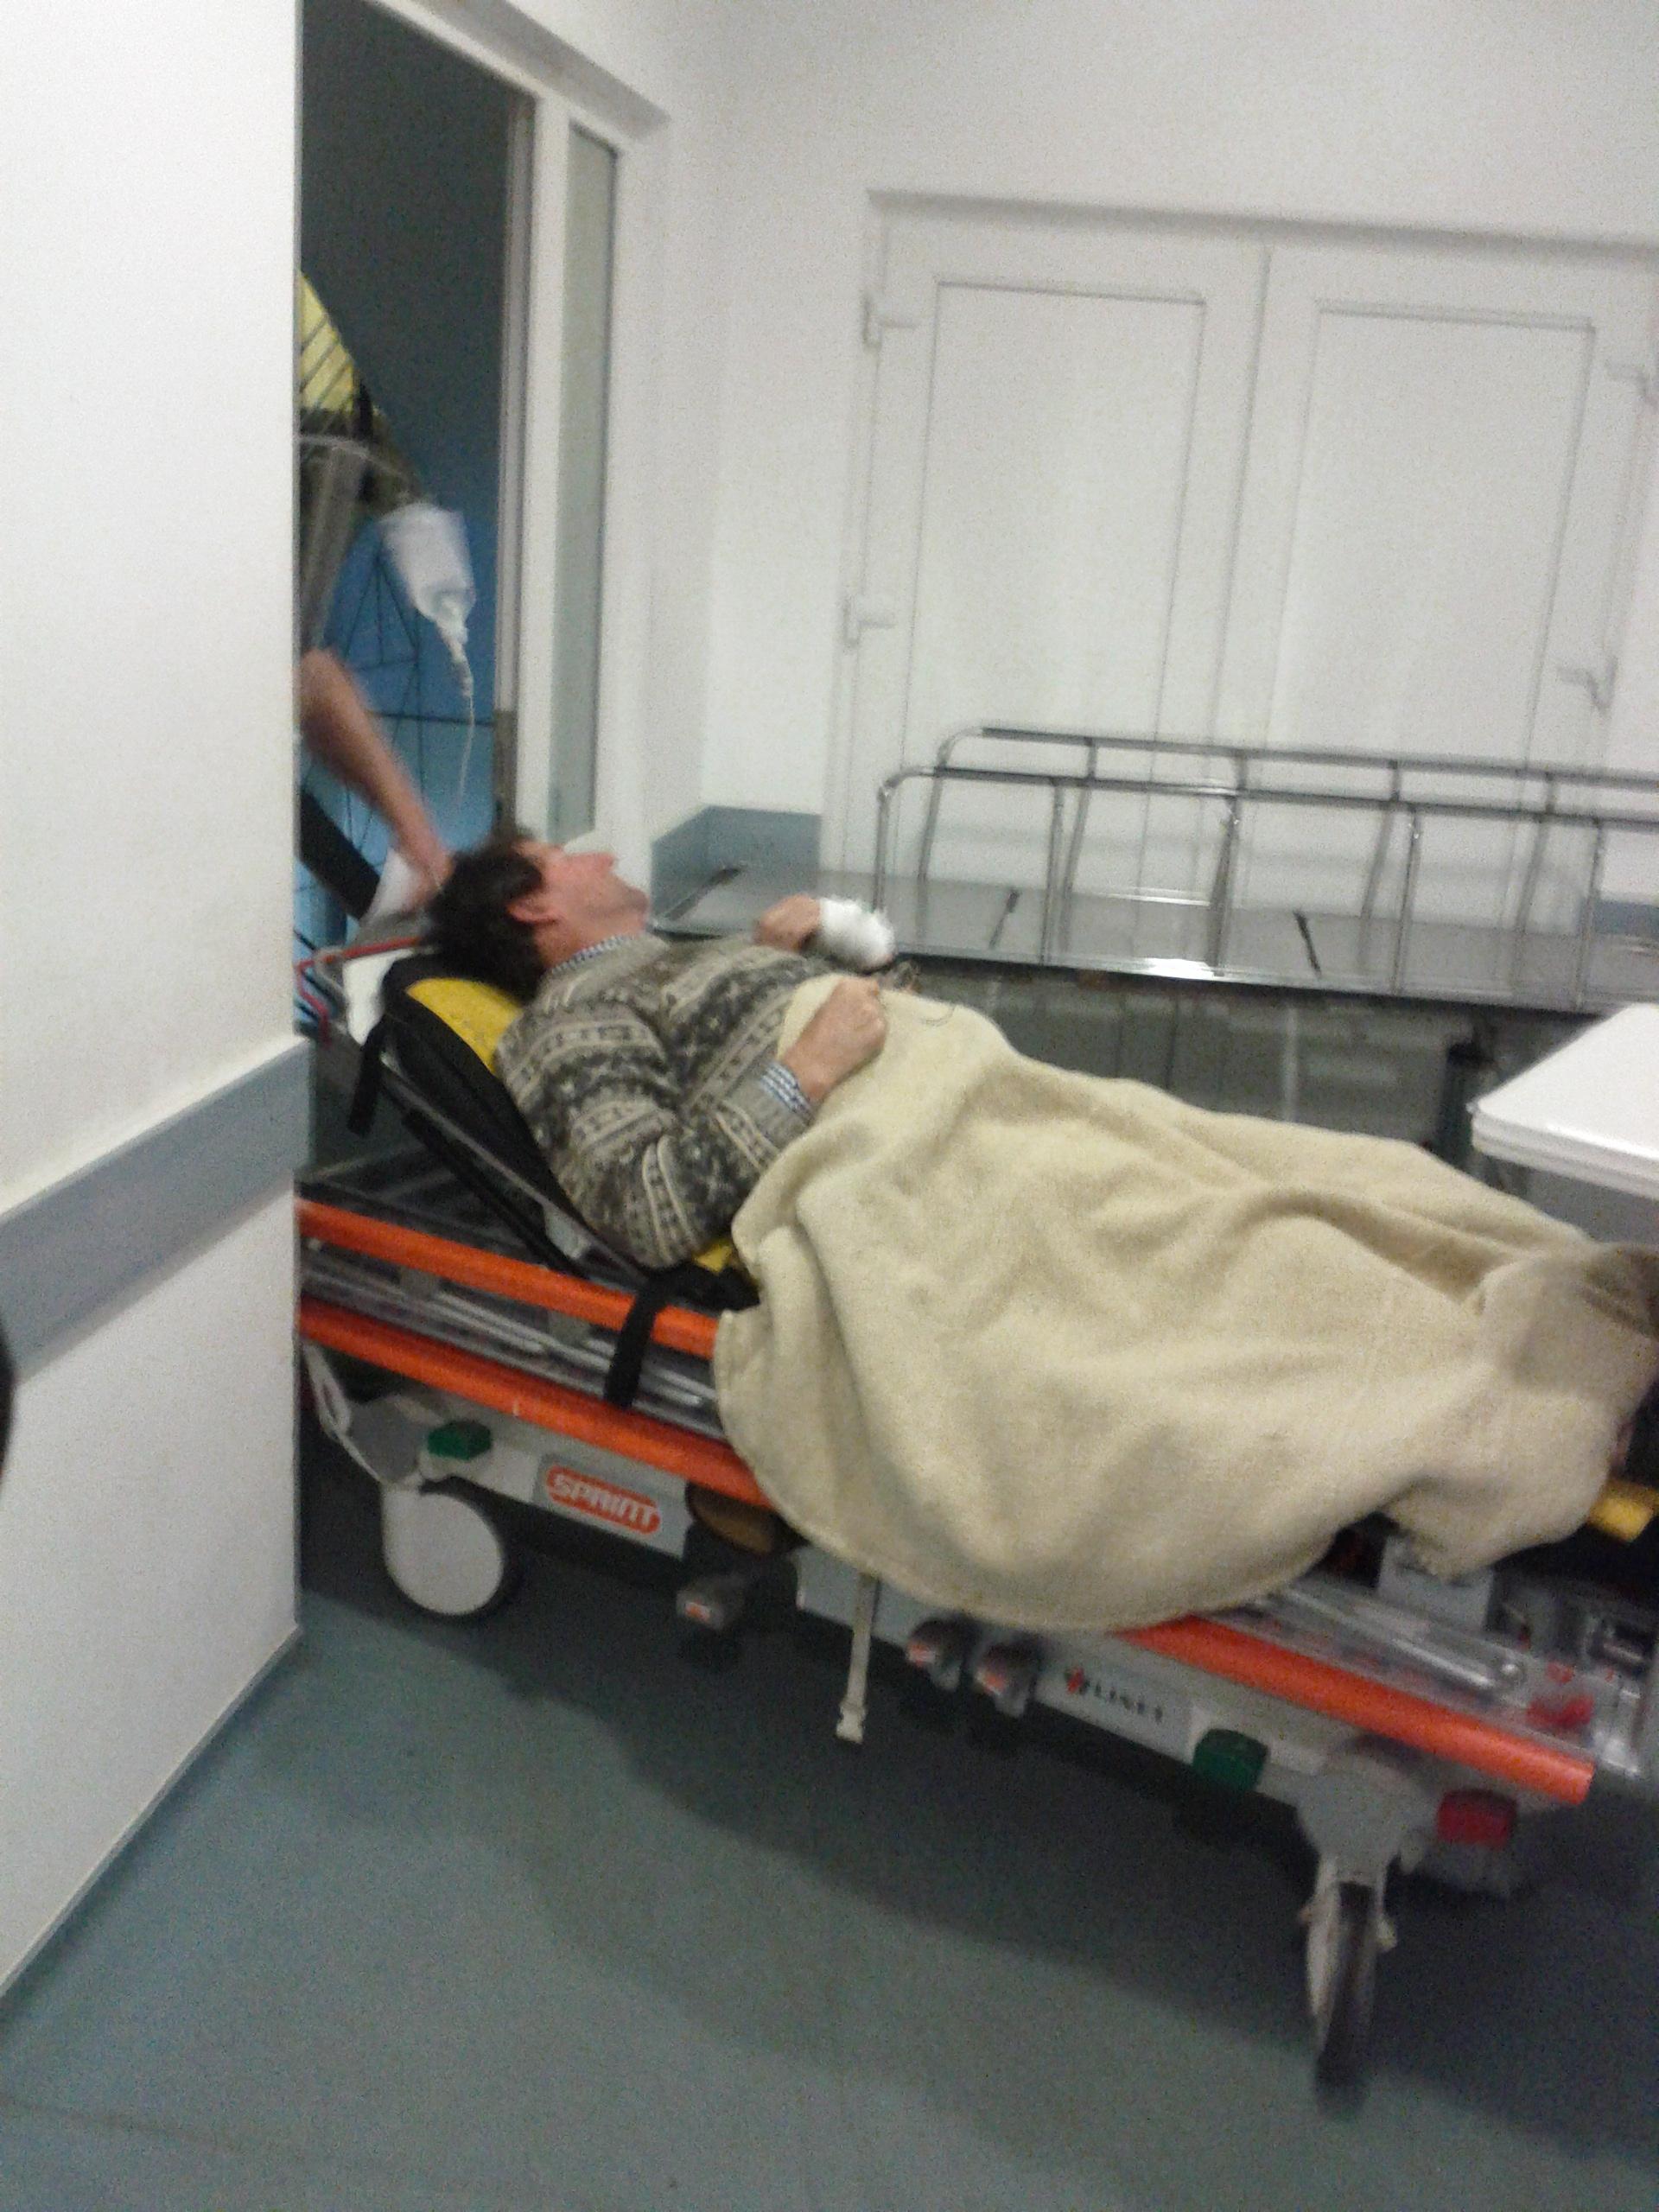 Un francez a fost impuscat la o partida de vanatoare de mistreti, organizata in Arad